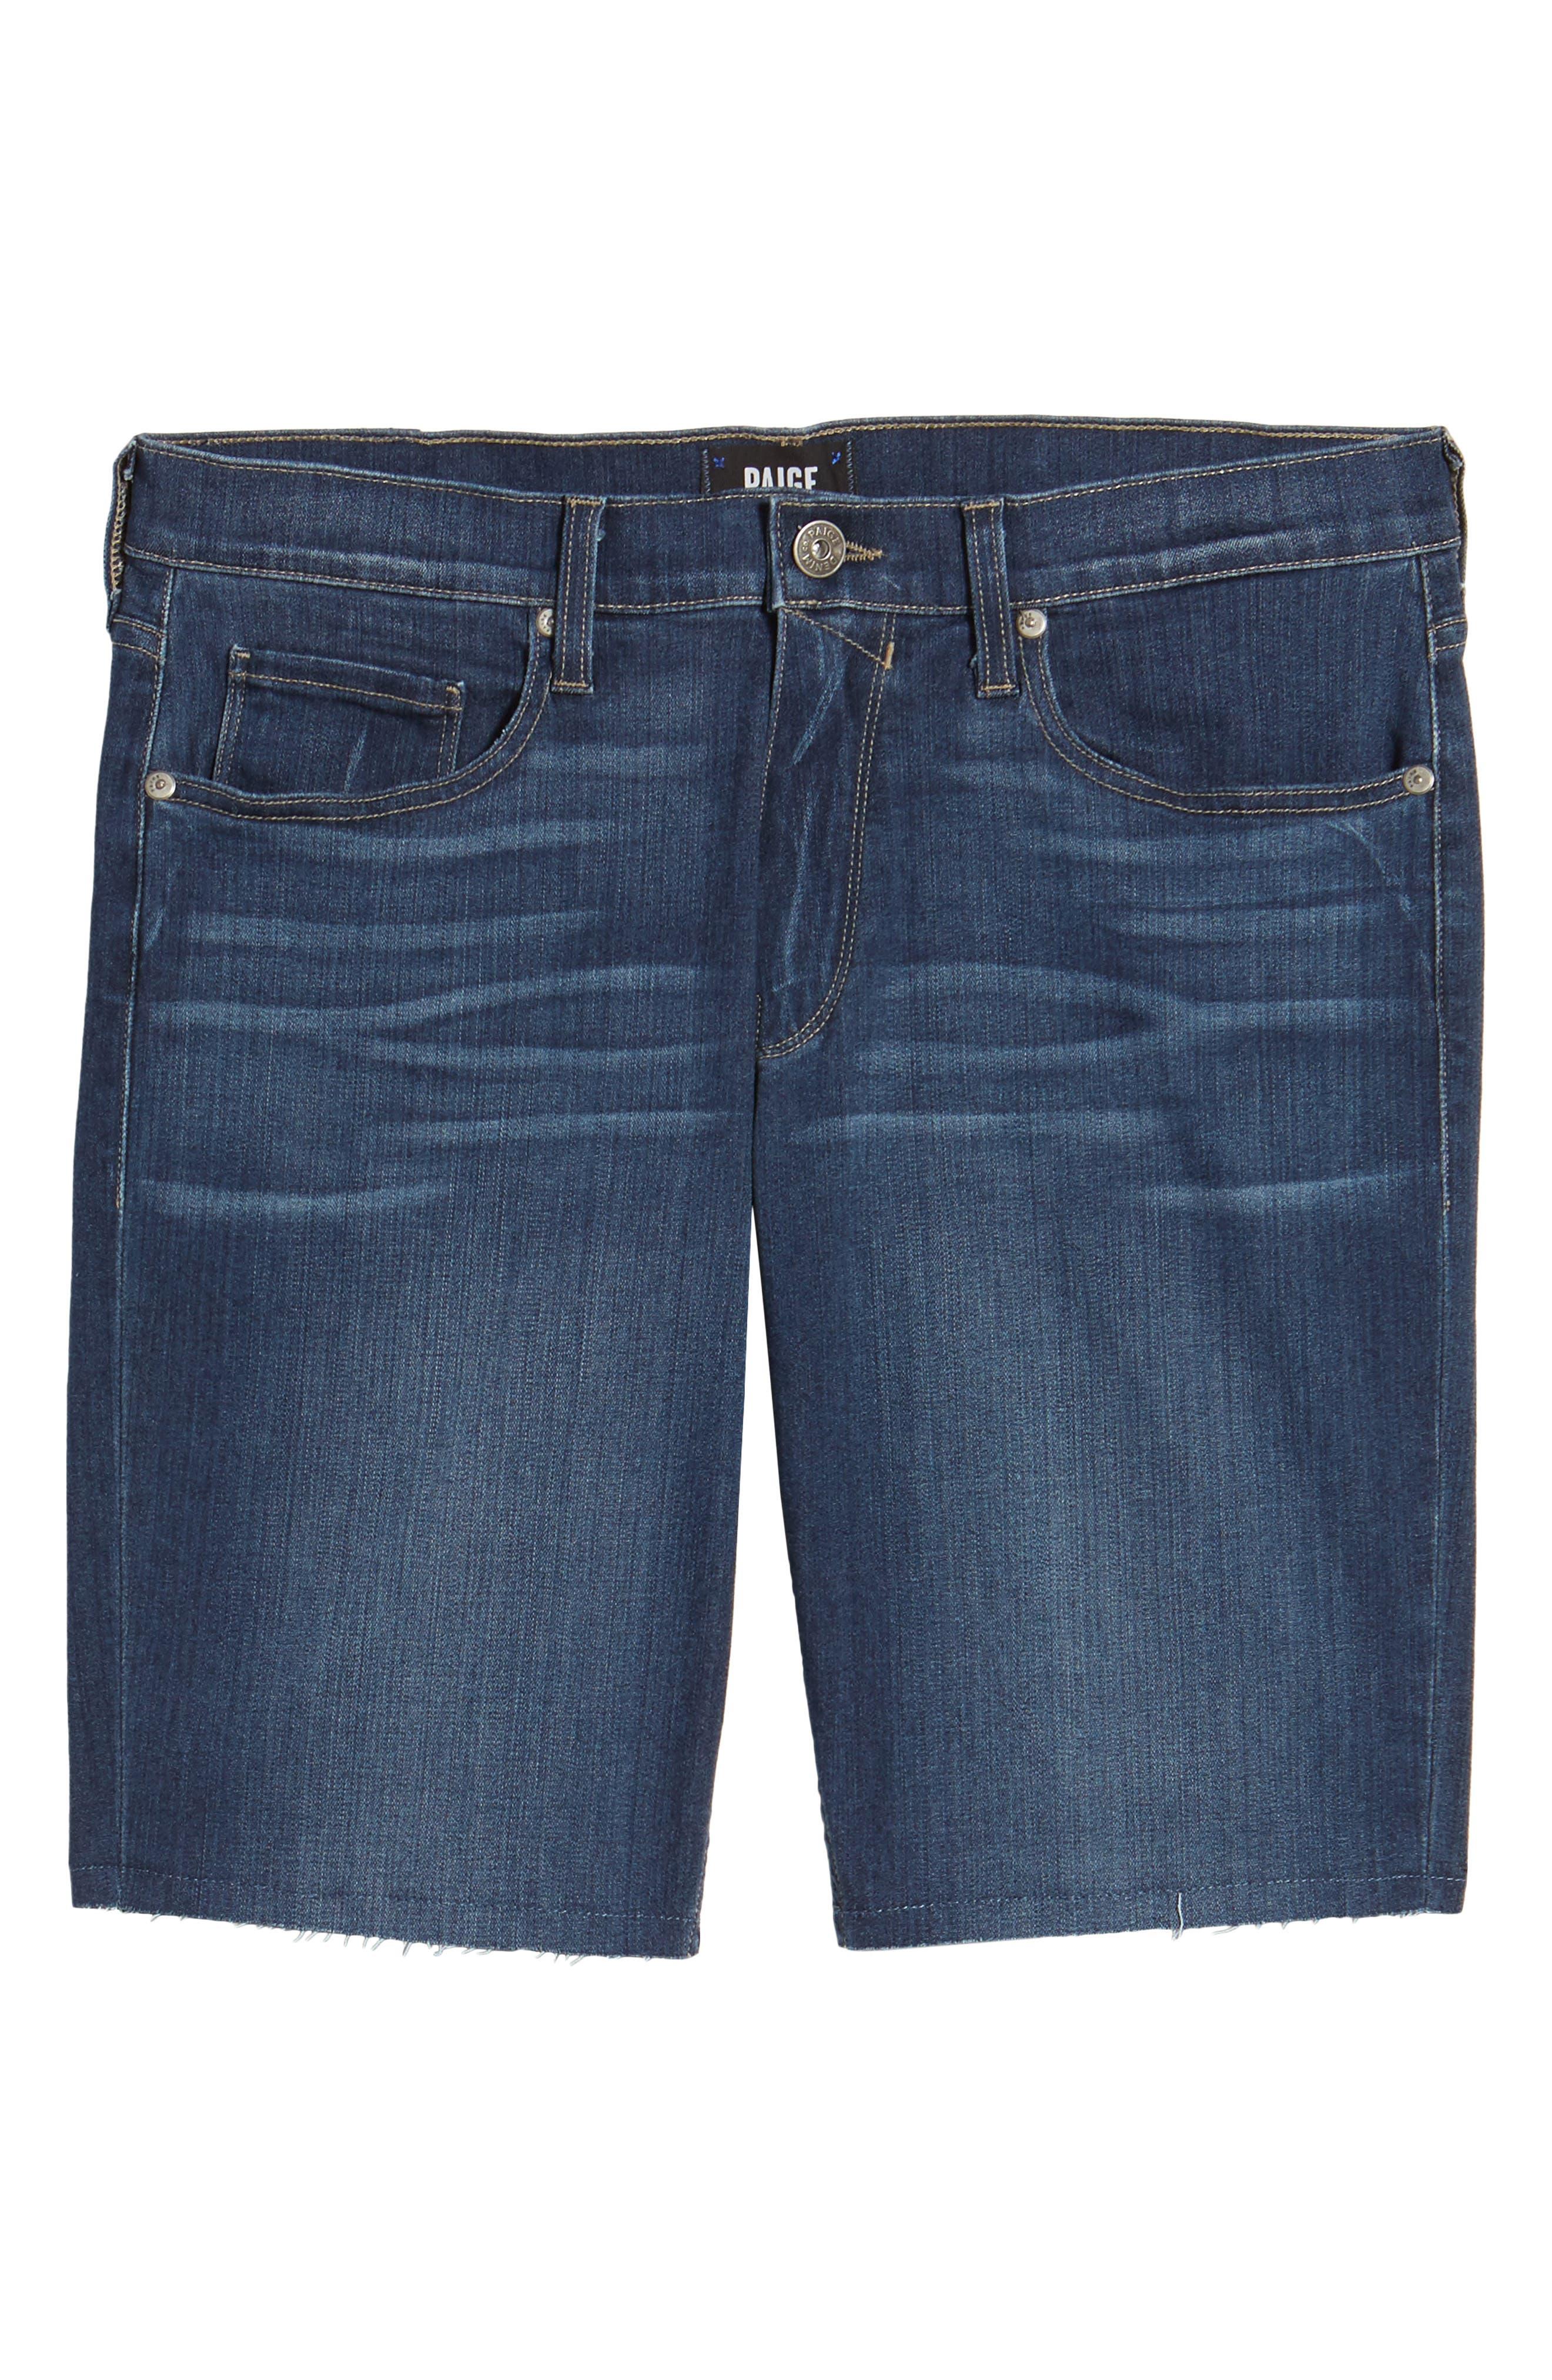 Transcend - Federal Slim Straight Leg Denim Shorts,                             Alternate thumbnail 5, color,                             Leo